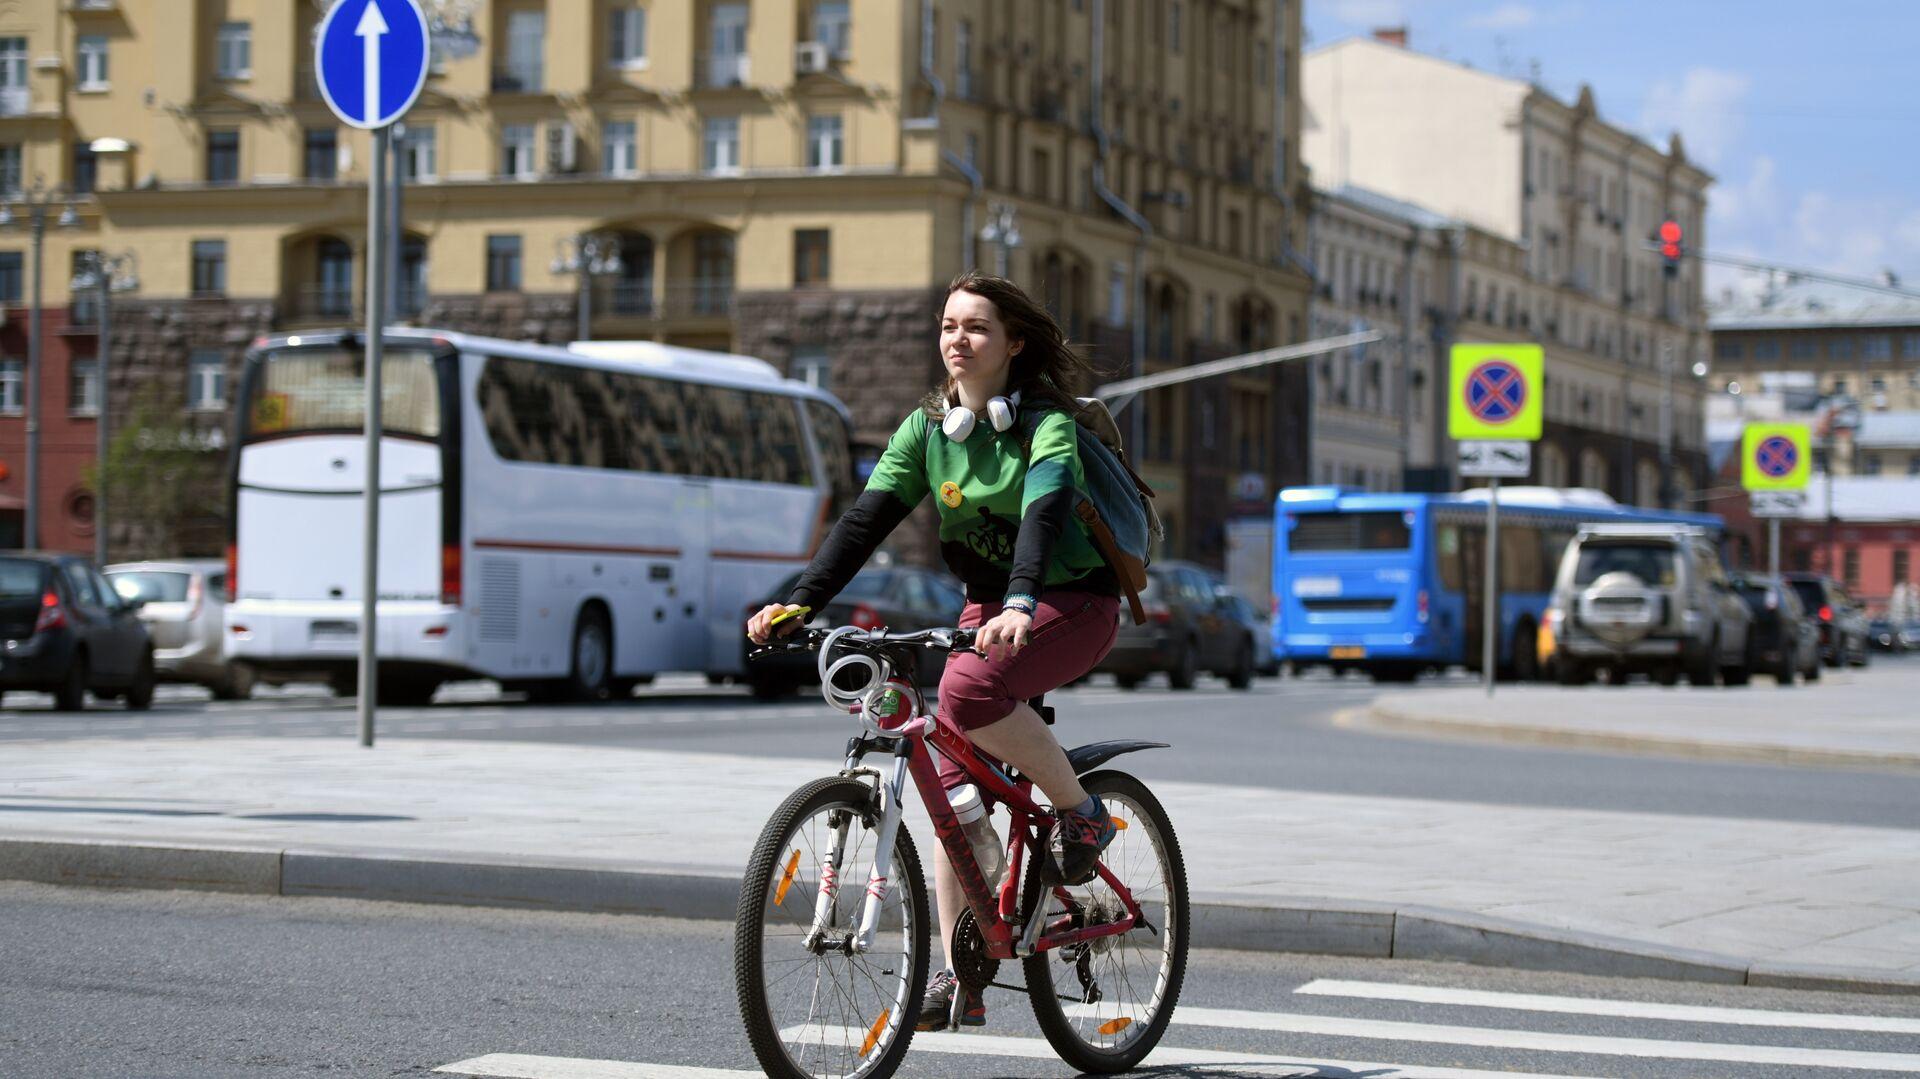 Una ragazza attraversa in bicicletta una strada di Mosca - Sputnik Italia, 1920, 06.06.2021